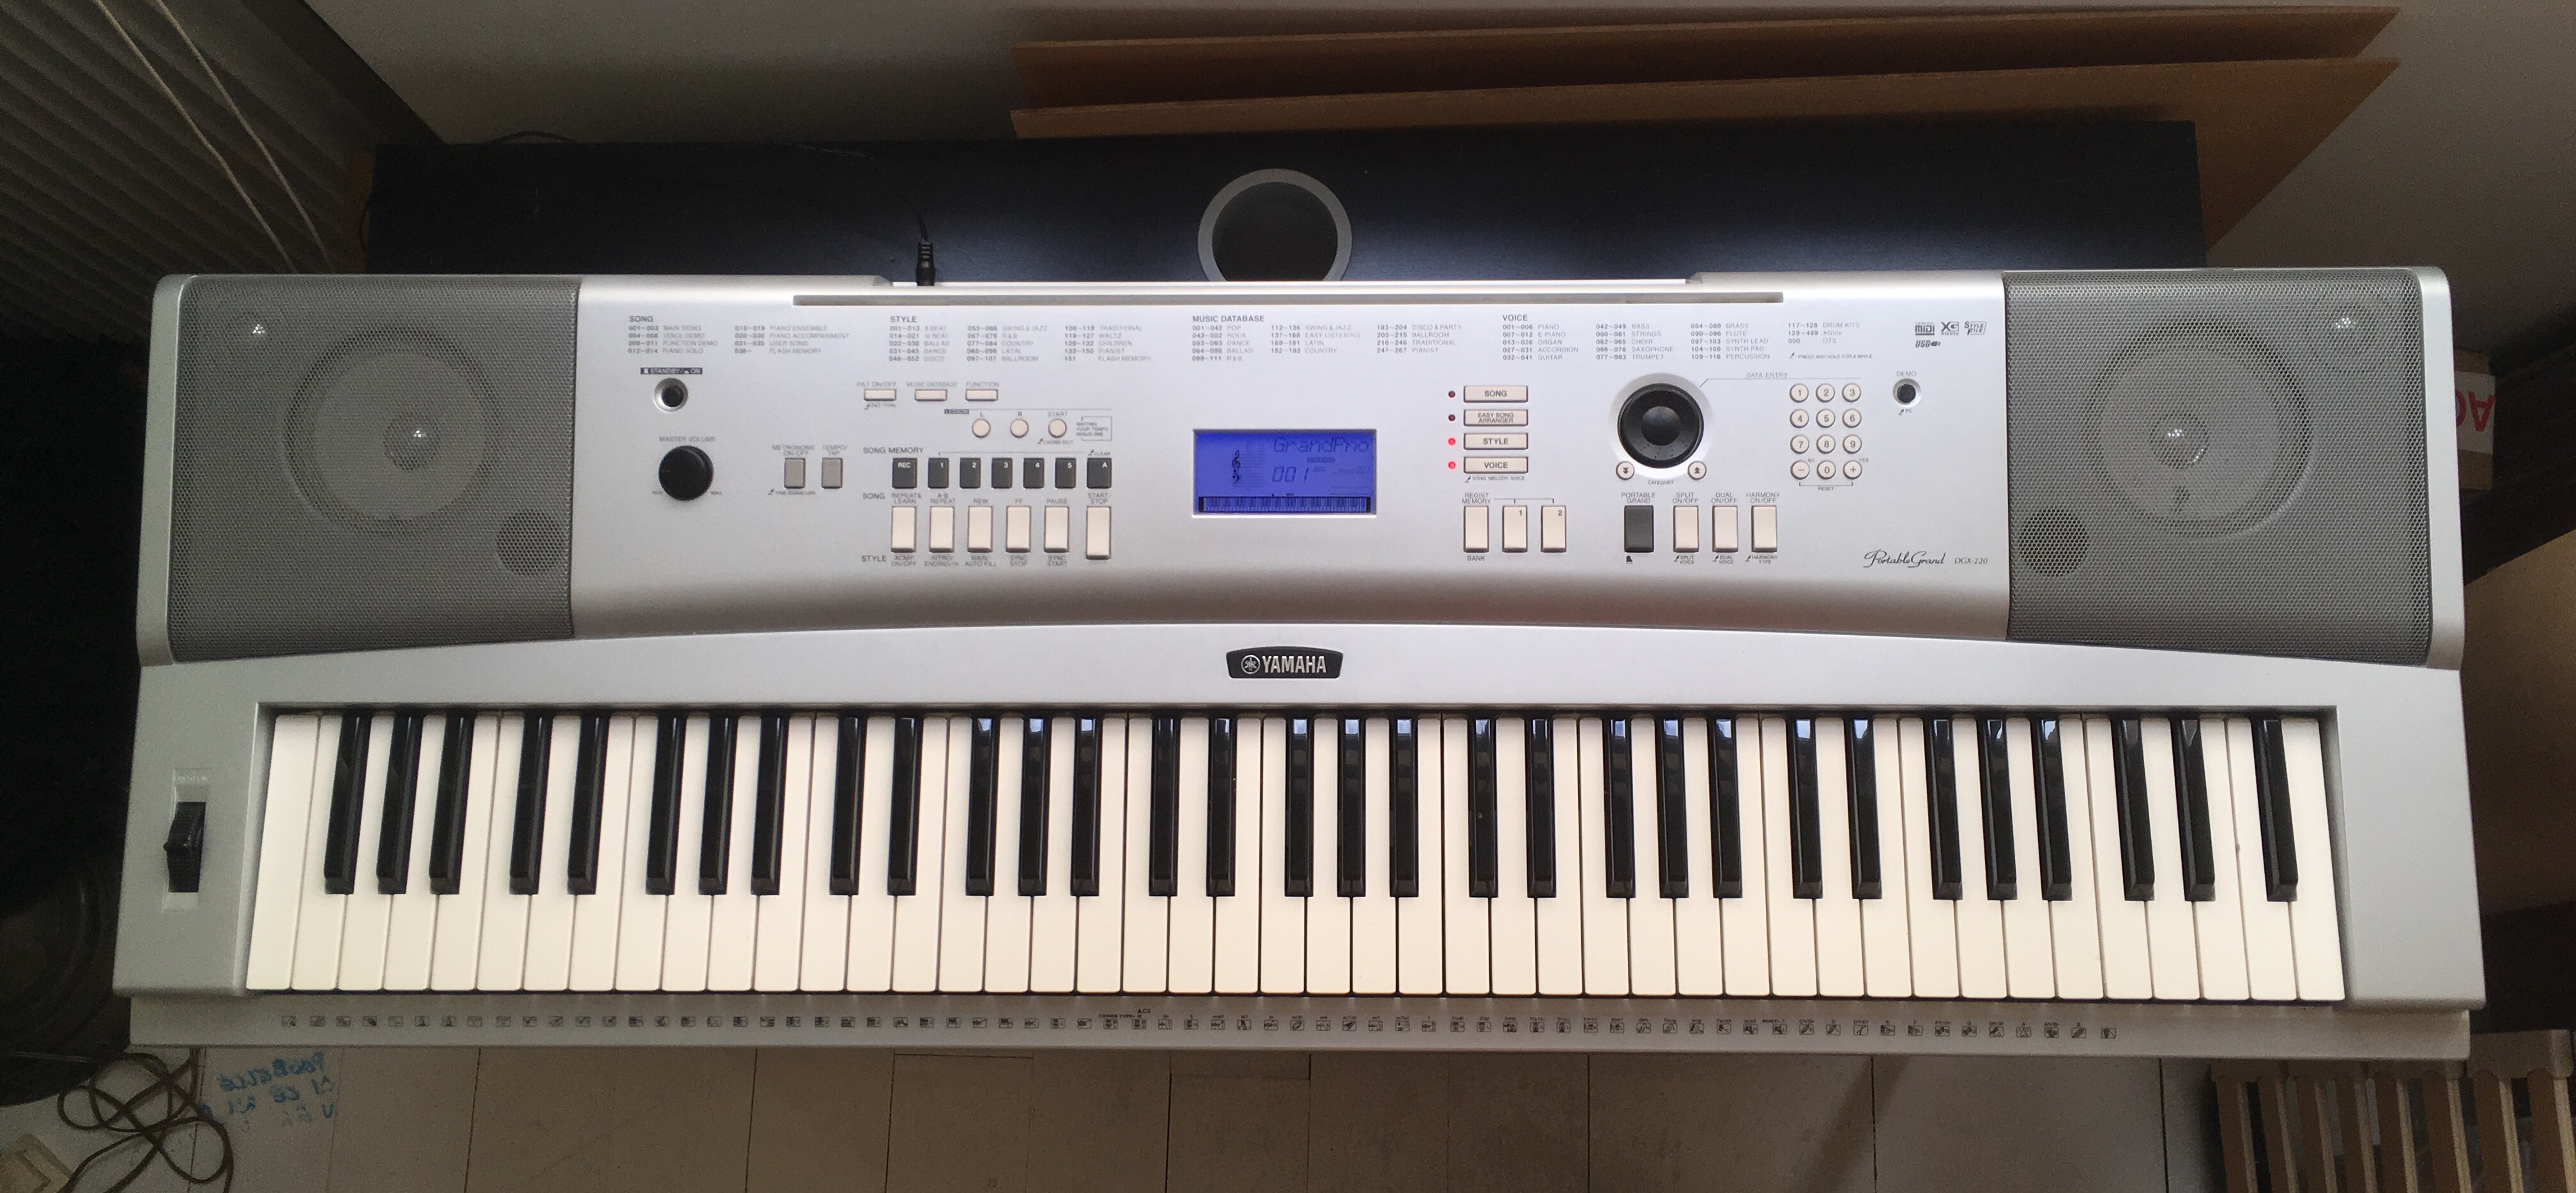 Piano num rique dgx 220 comme neuf ile de france audiofanzine for Yamaha portable grand dgx 220 electronic keyboard